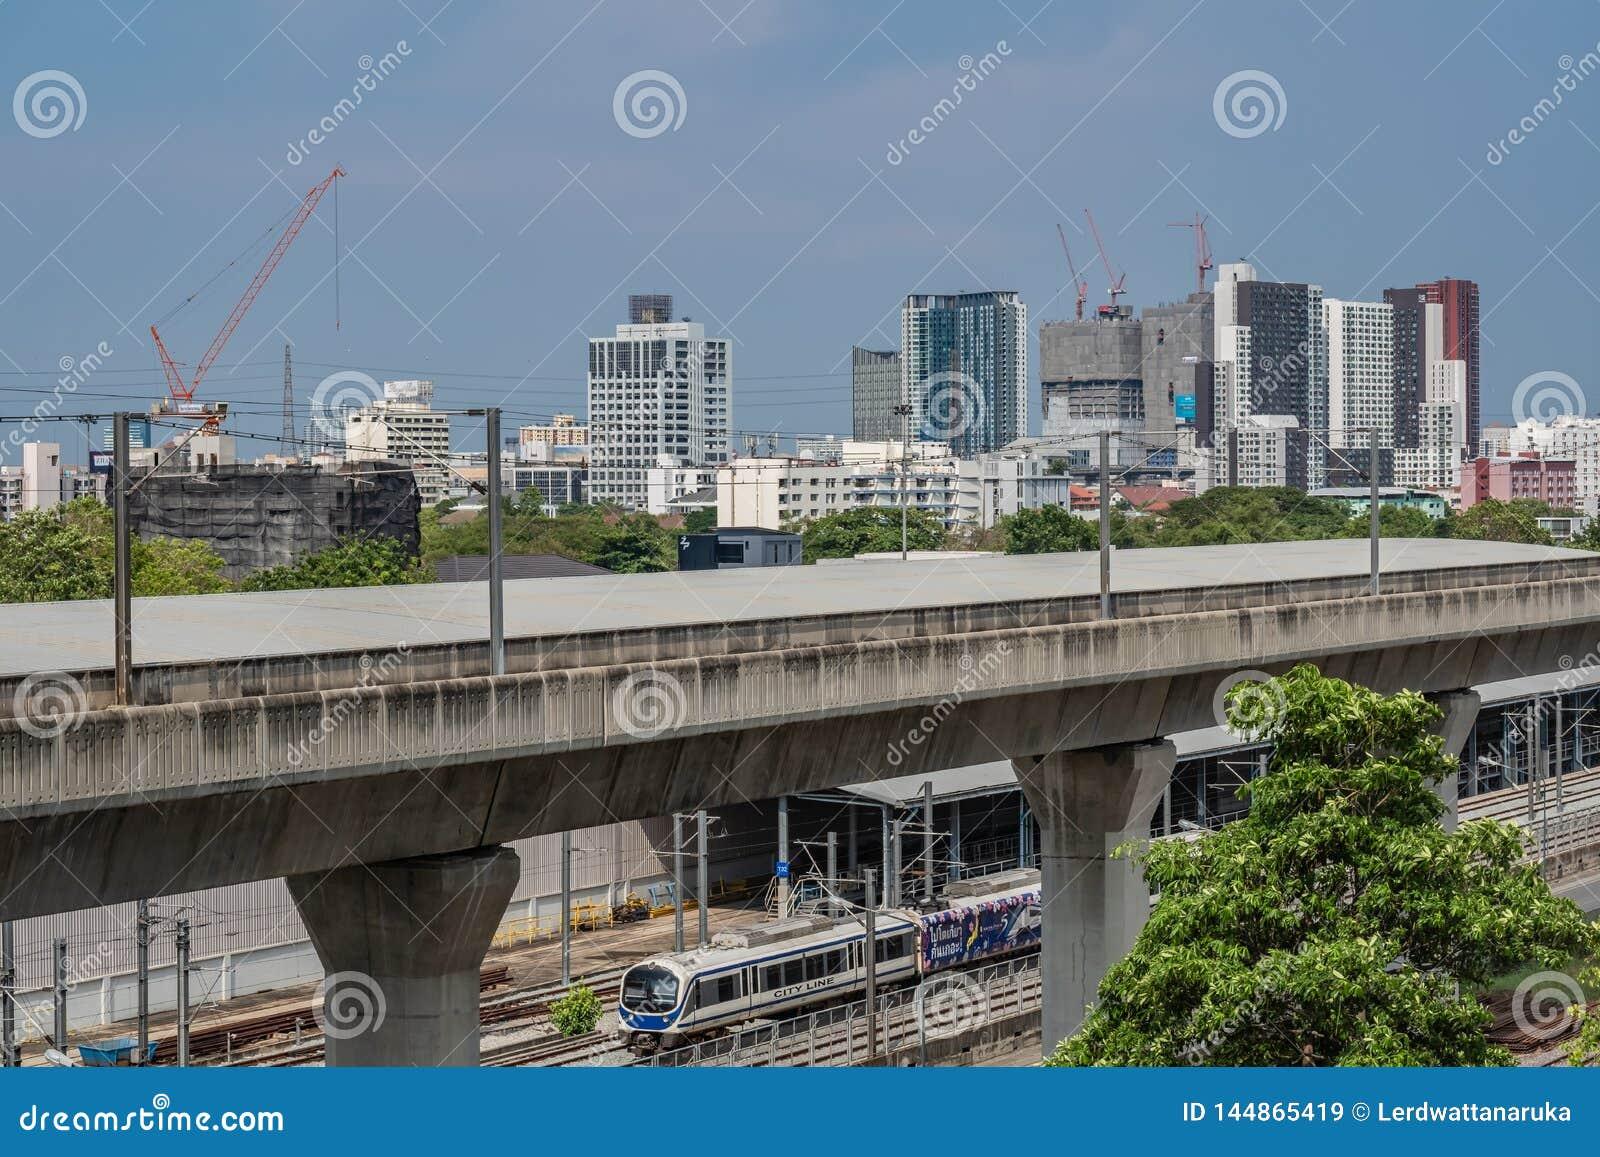 Bangkok, Thailand 14 April 2019: Hemeltrein Bangkok en de garage van de hemeltrein